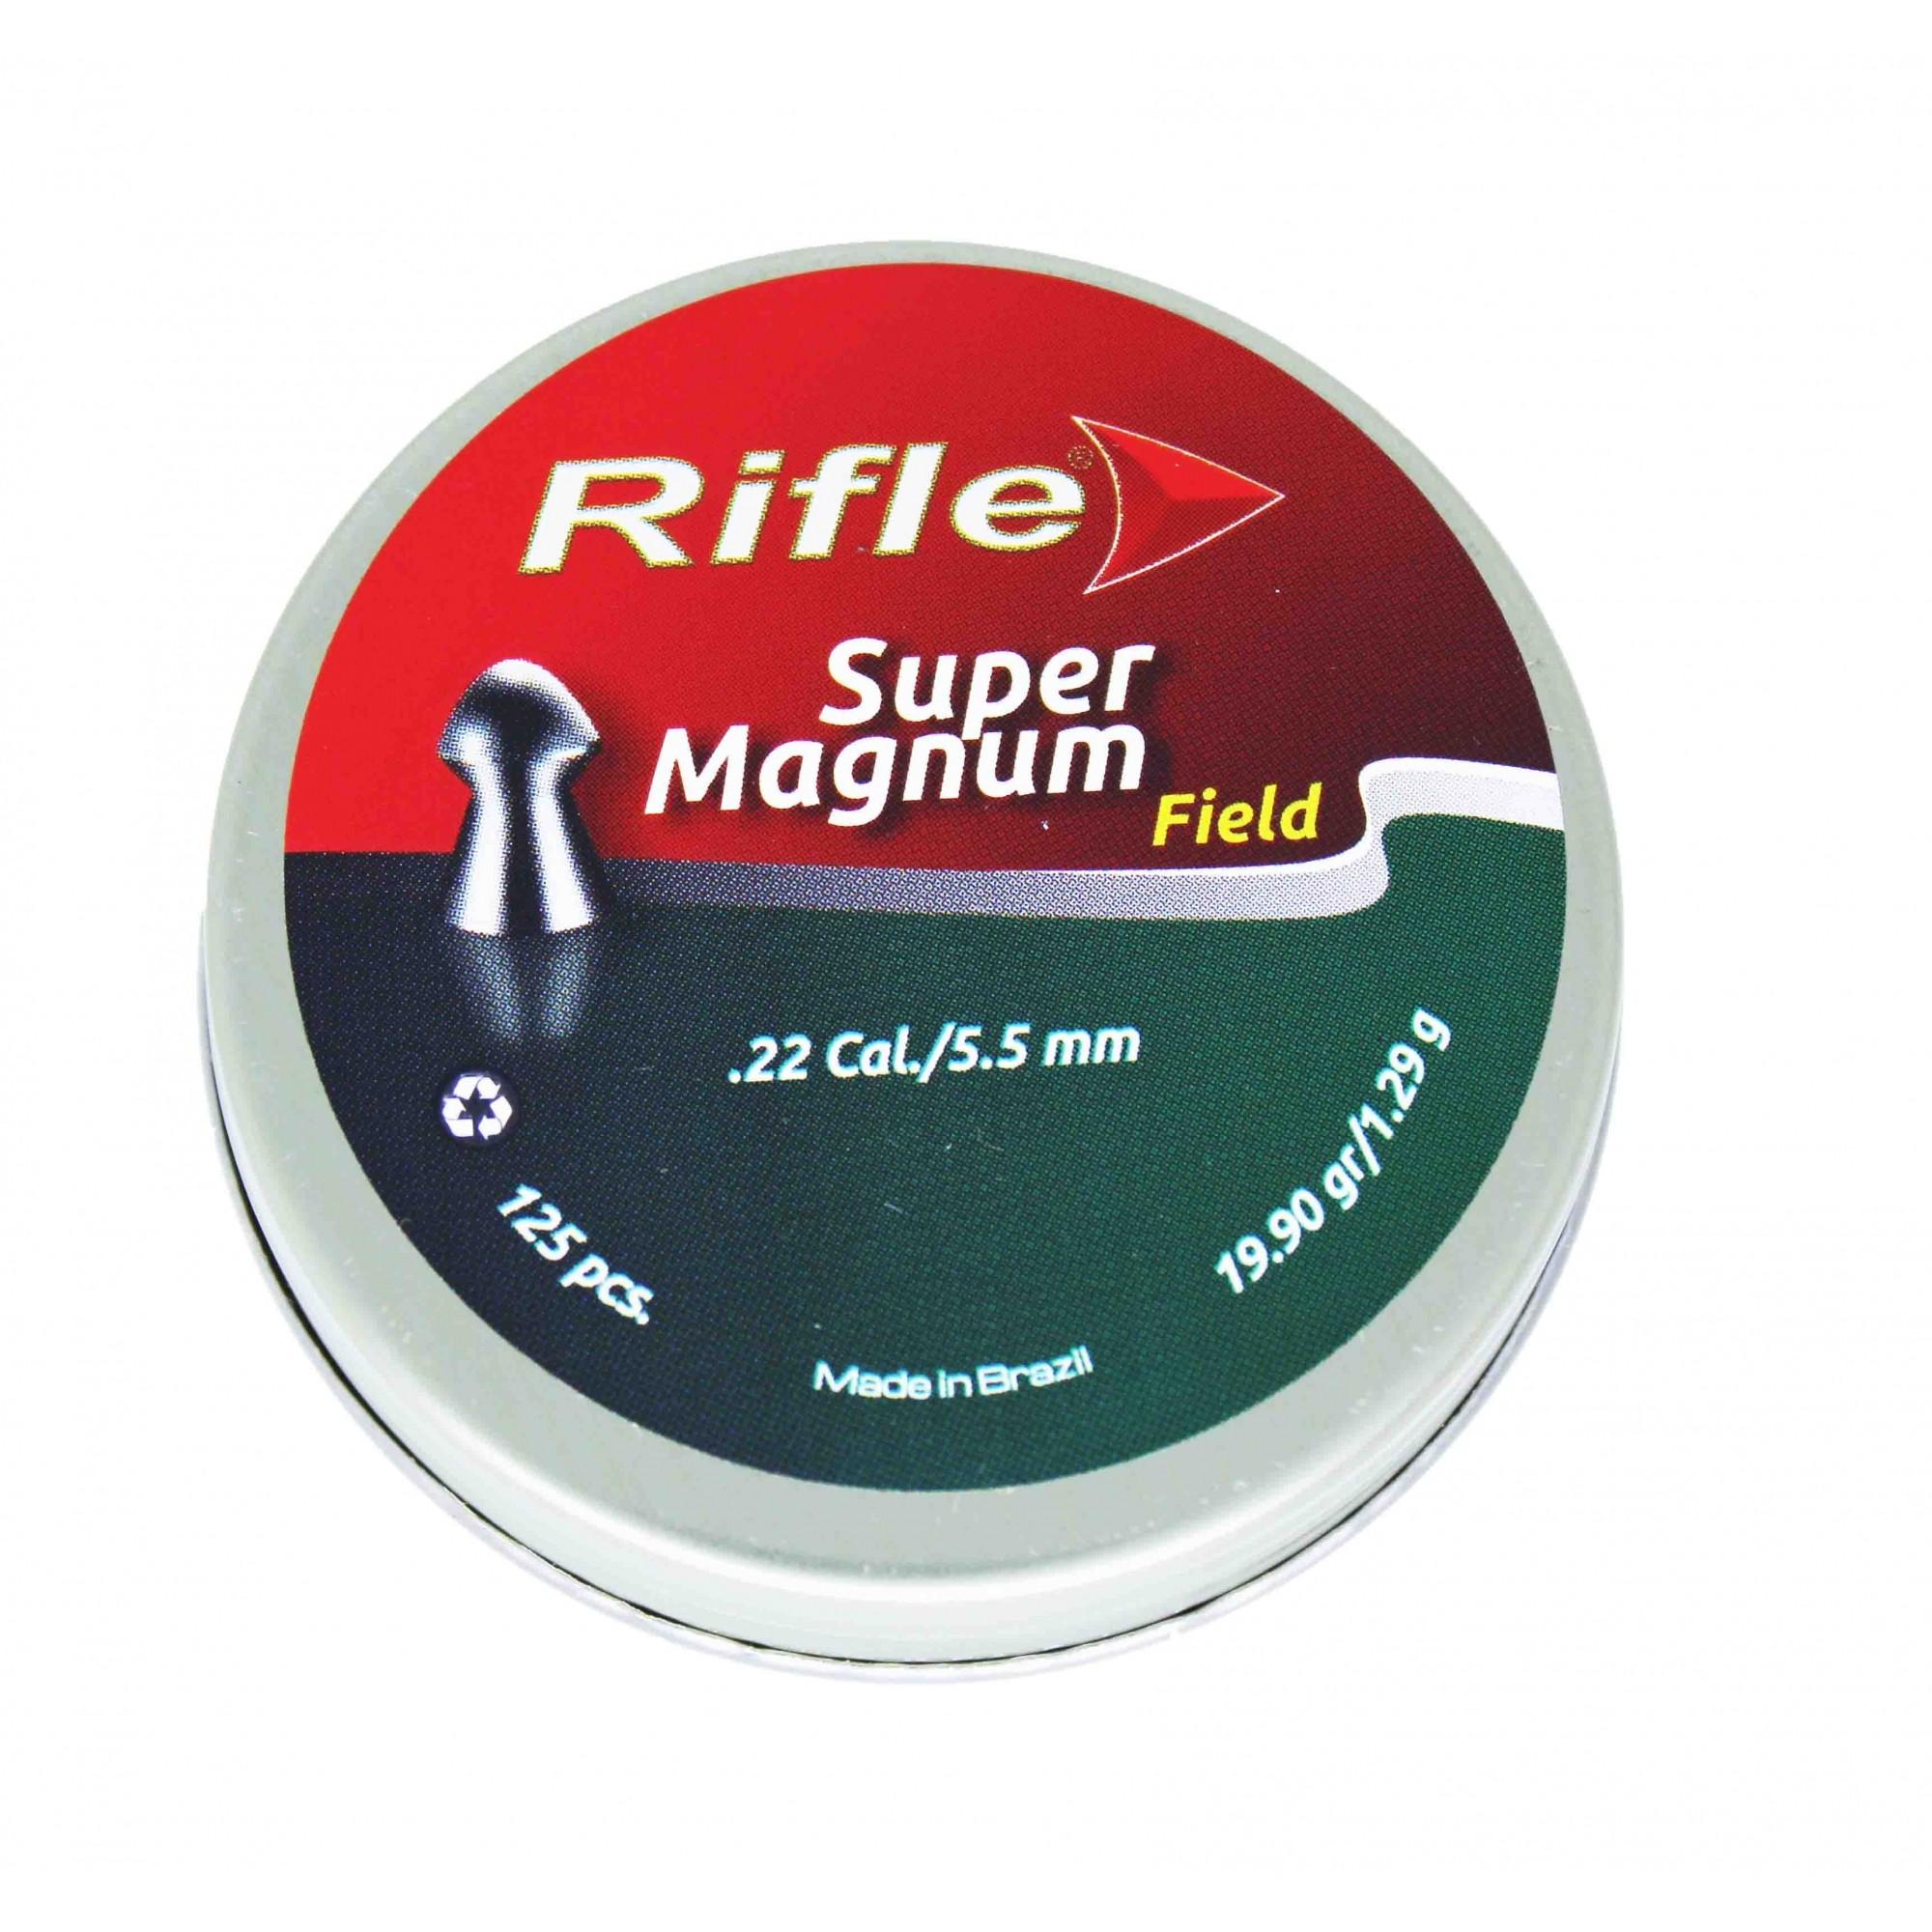 Chumbinho Rifle Super Magnum Field 5.5mm .22 Cal 125 Und.